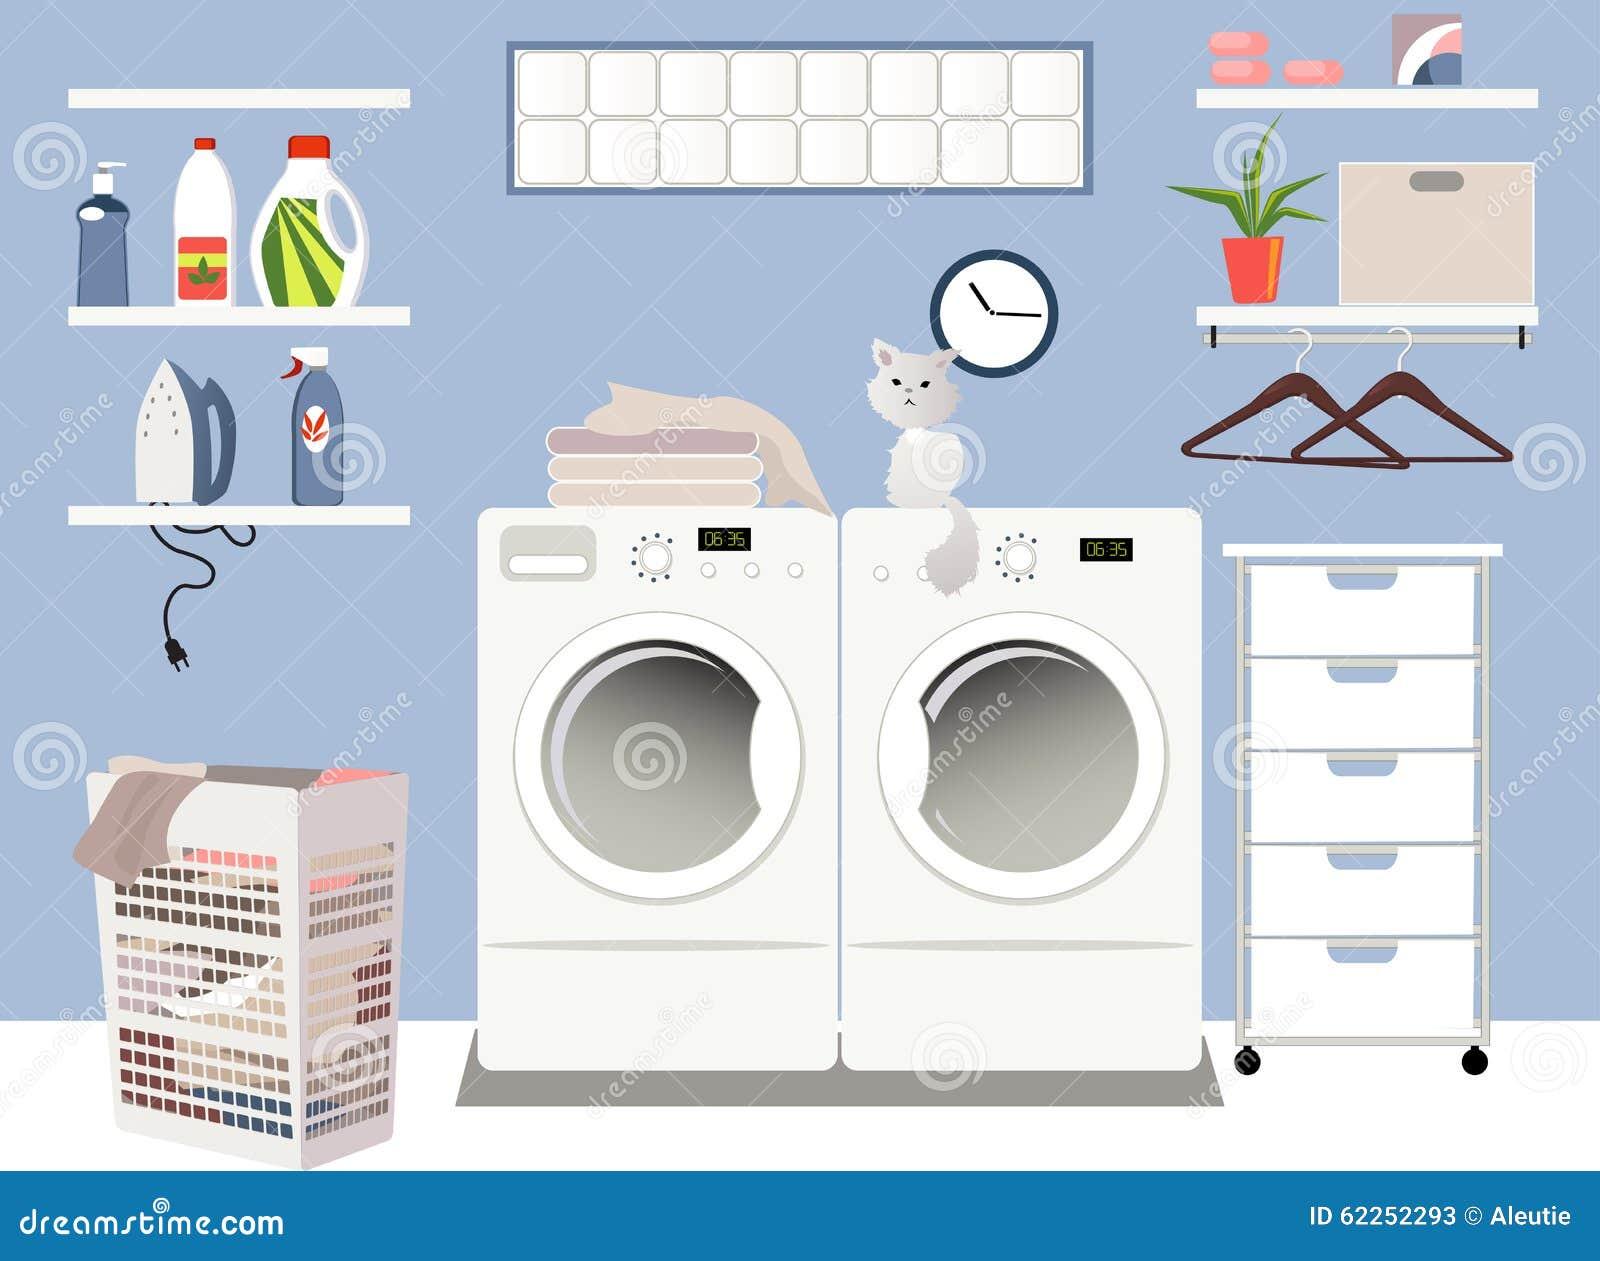 Laundry Room Cartoon Vector Cartoondealer Com 62252293